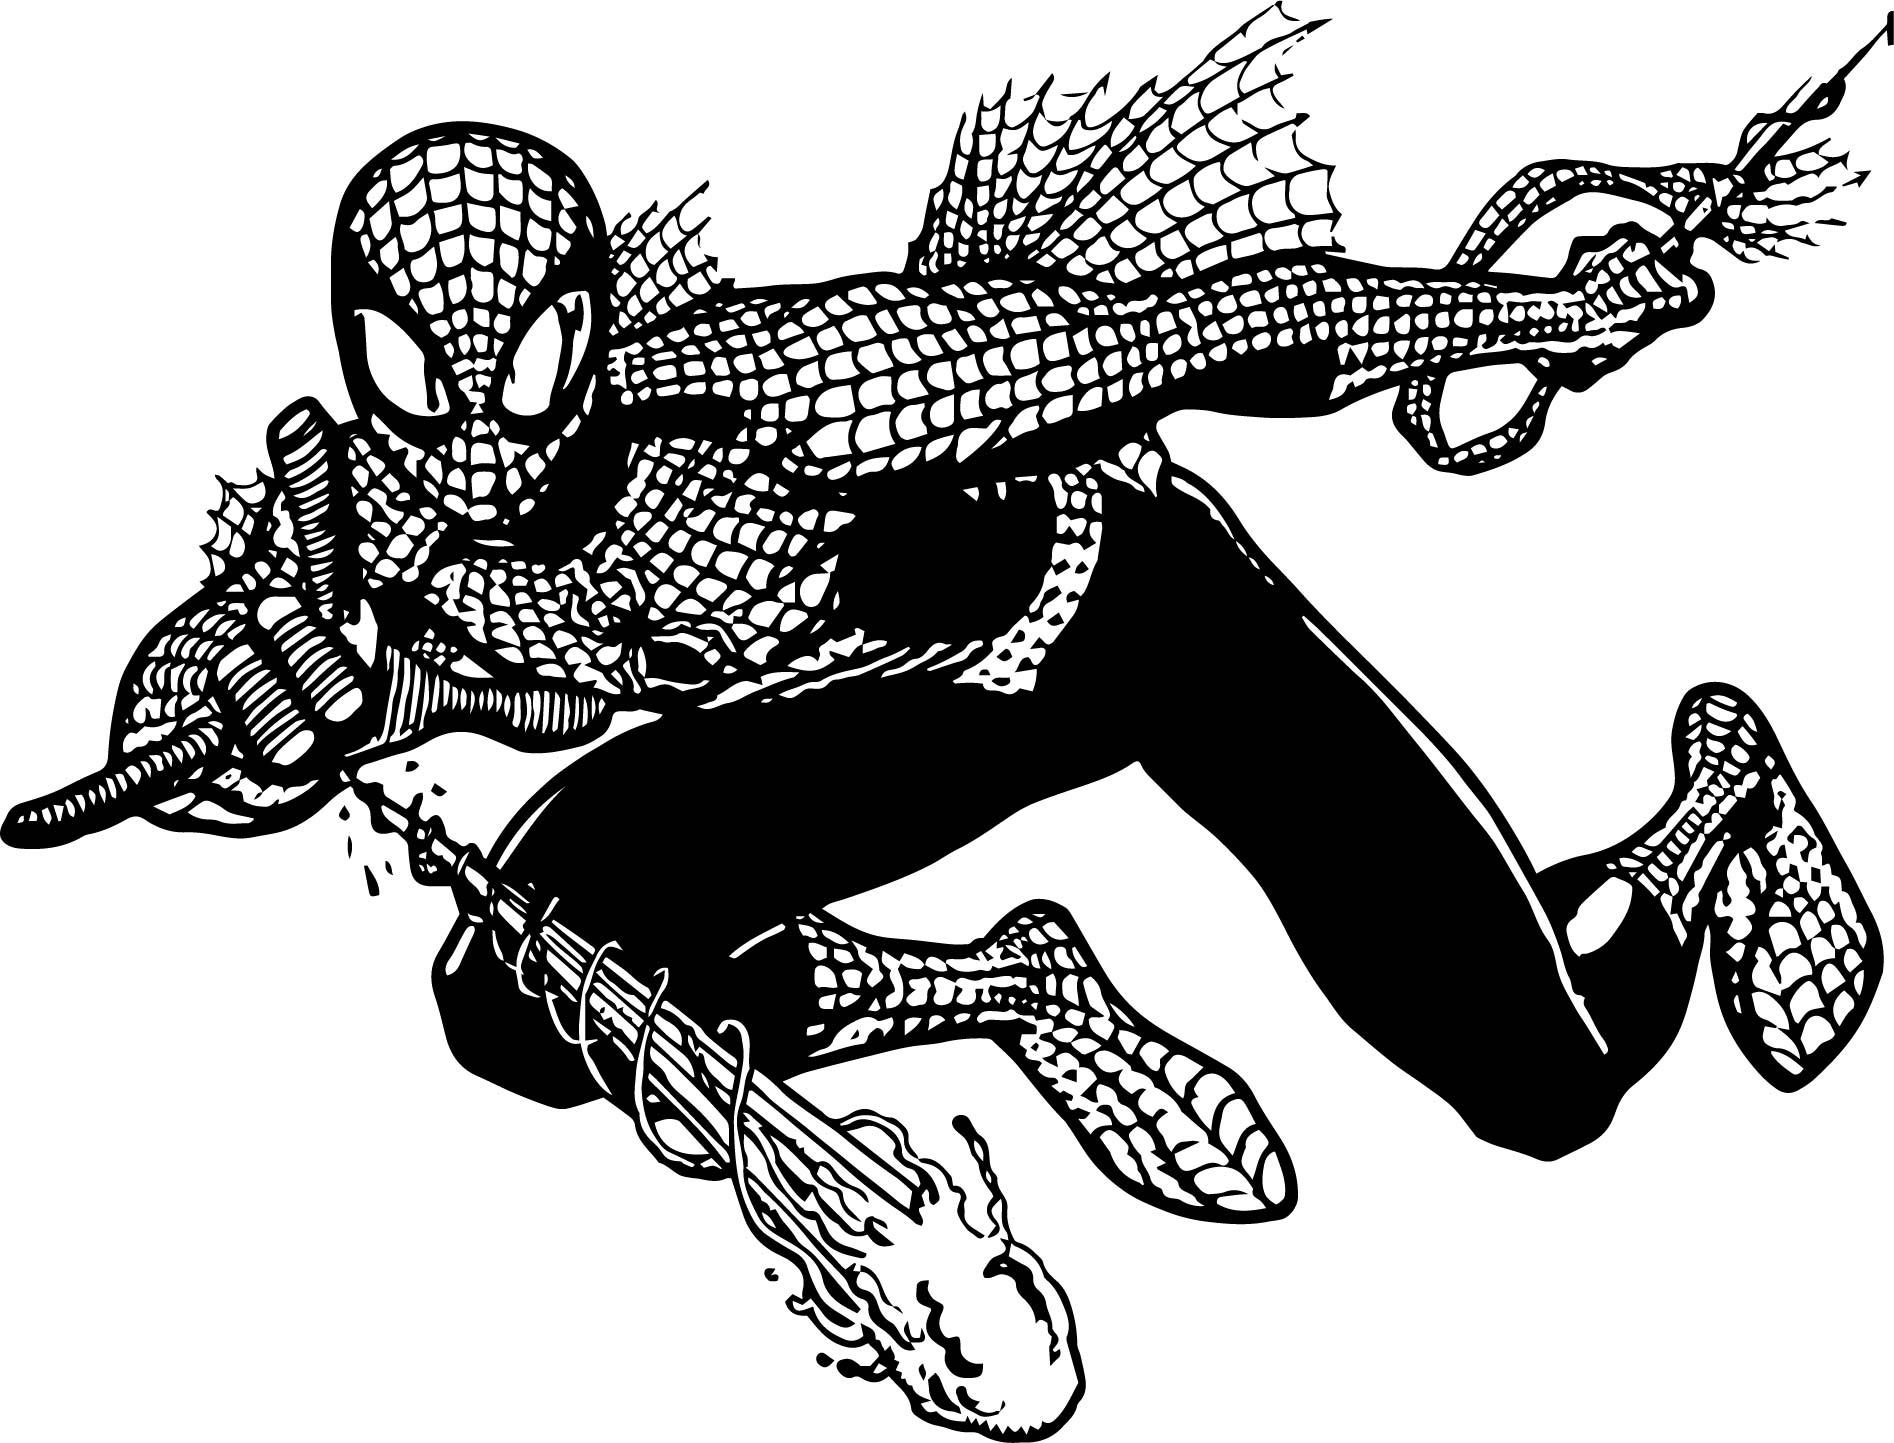 Barcelona Vs Manchester City Logo: Spiderman Cartoon HD Spider Man Coloring Page